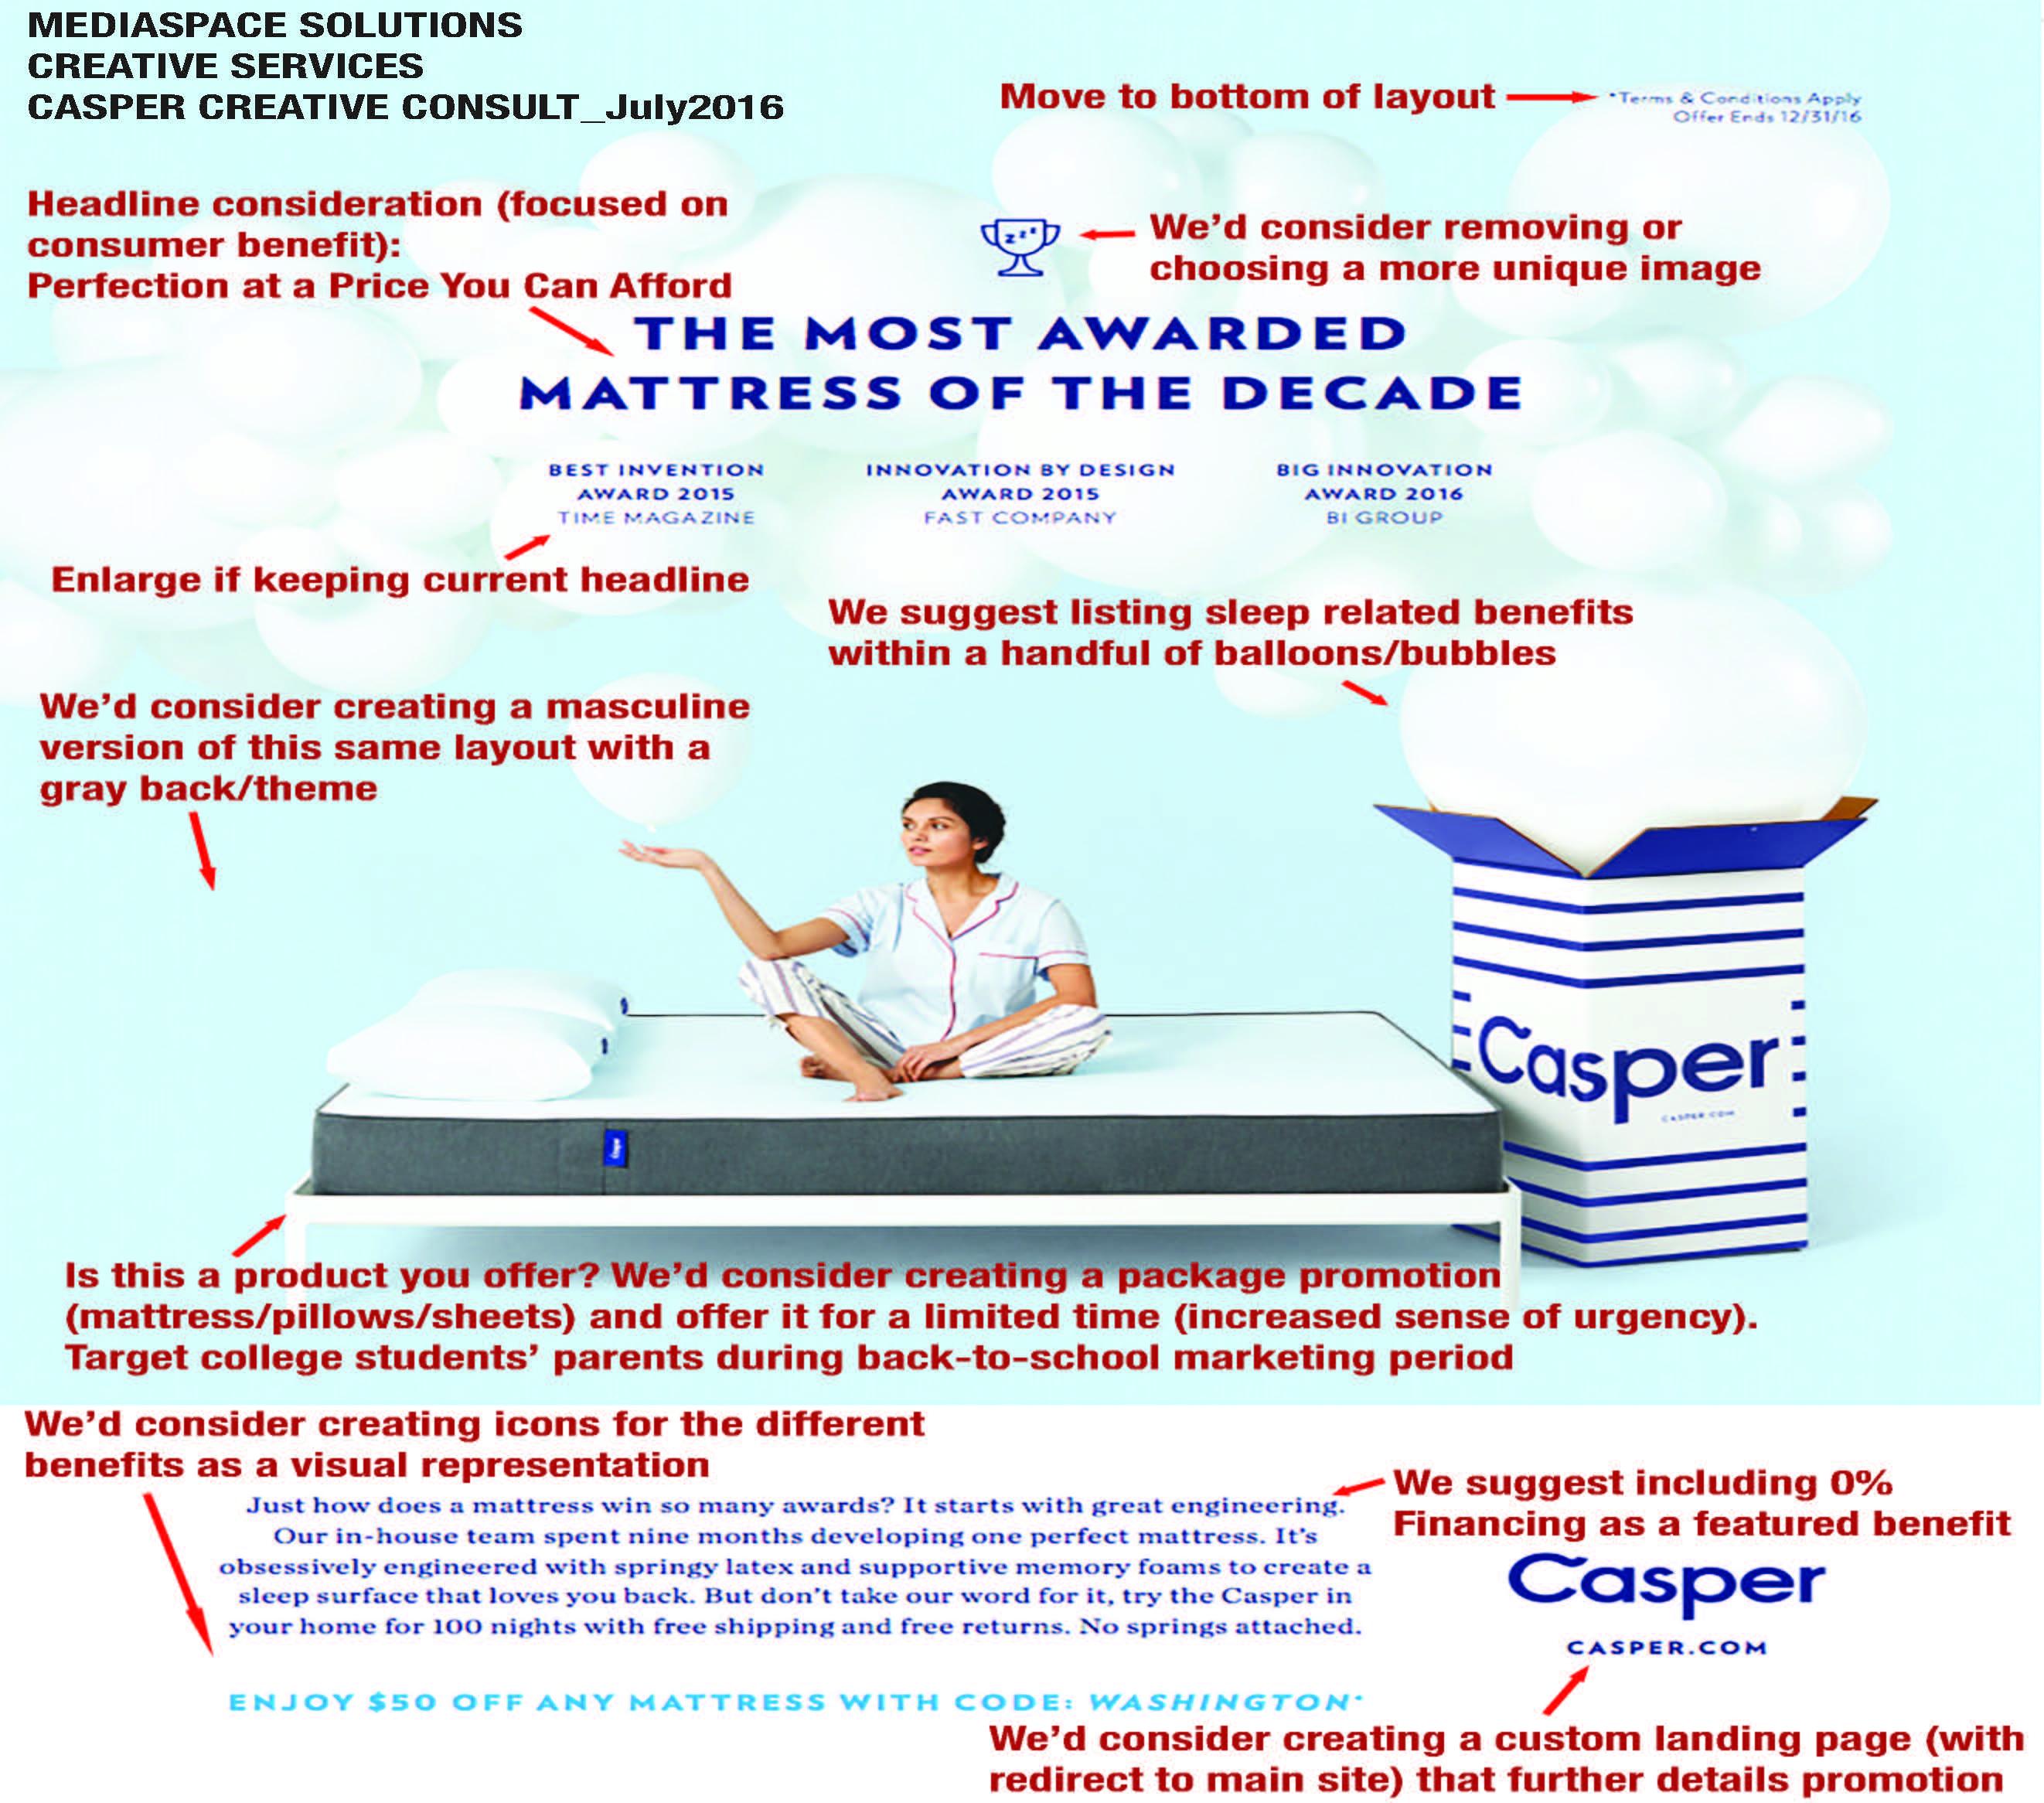 Casper_Consult.jpg